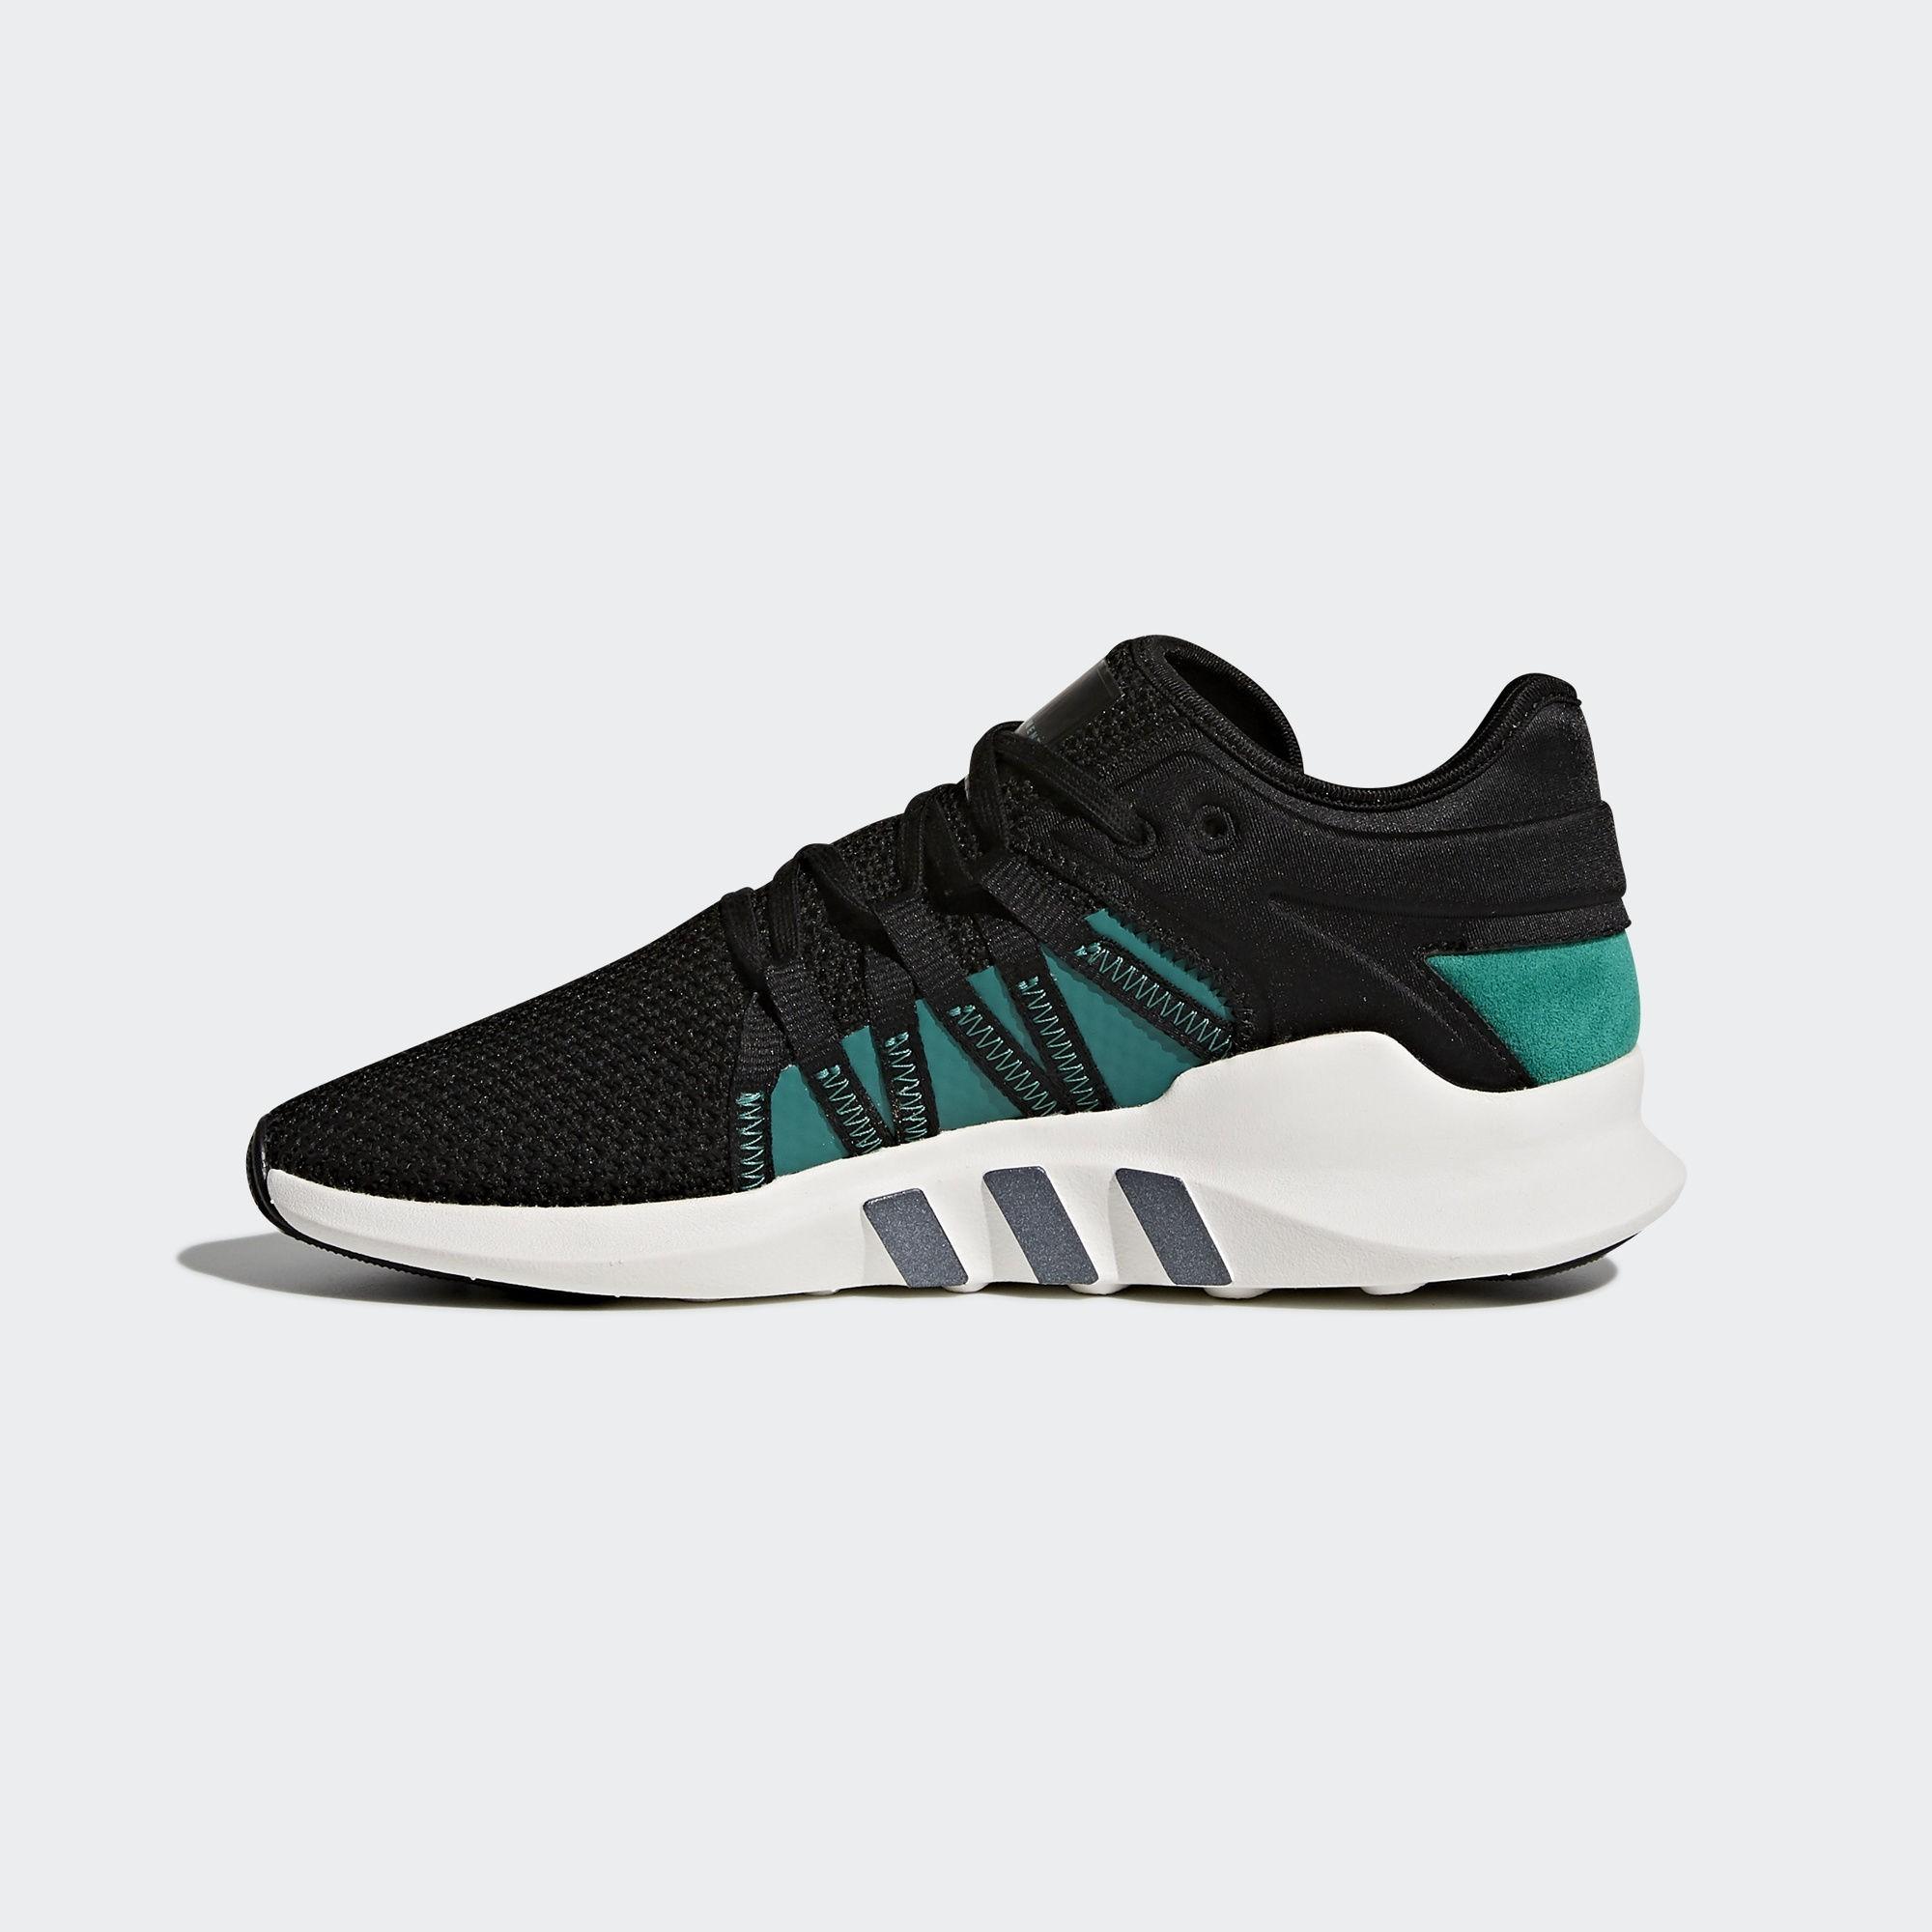 Adidas EQT Support ADV PK Negras CQ2158